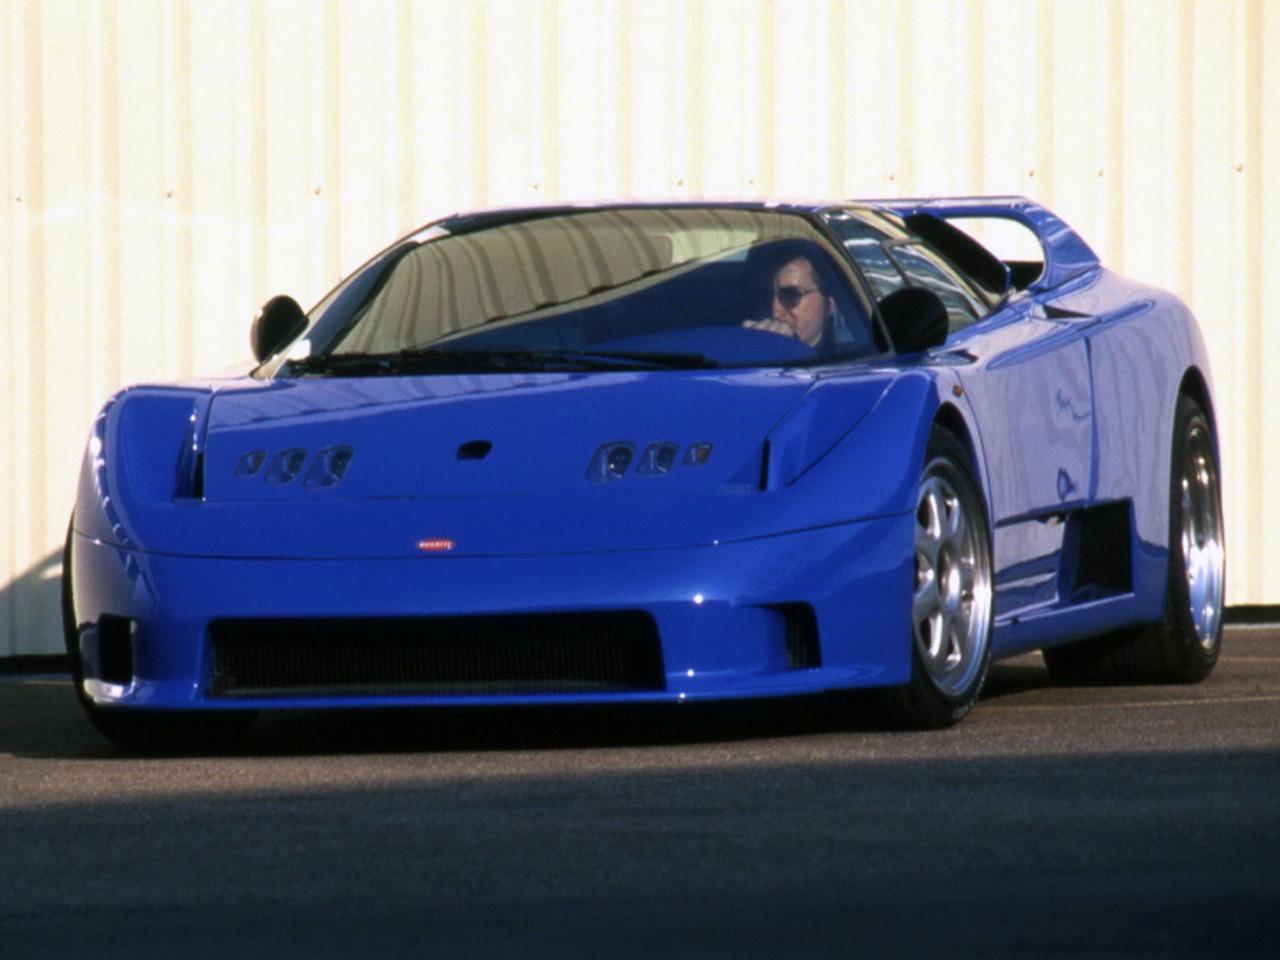 Bugatti Rinspeed Cyan (1994) – Old Concept Cars